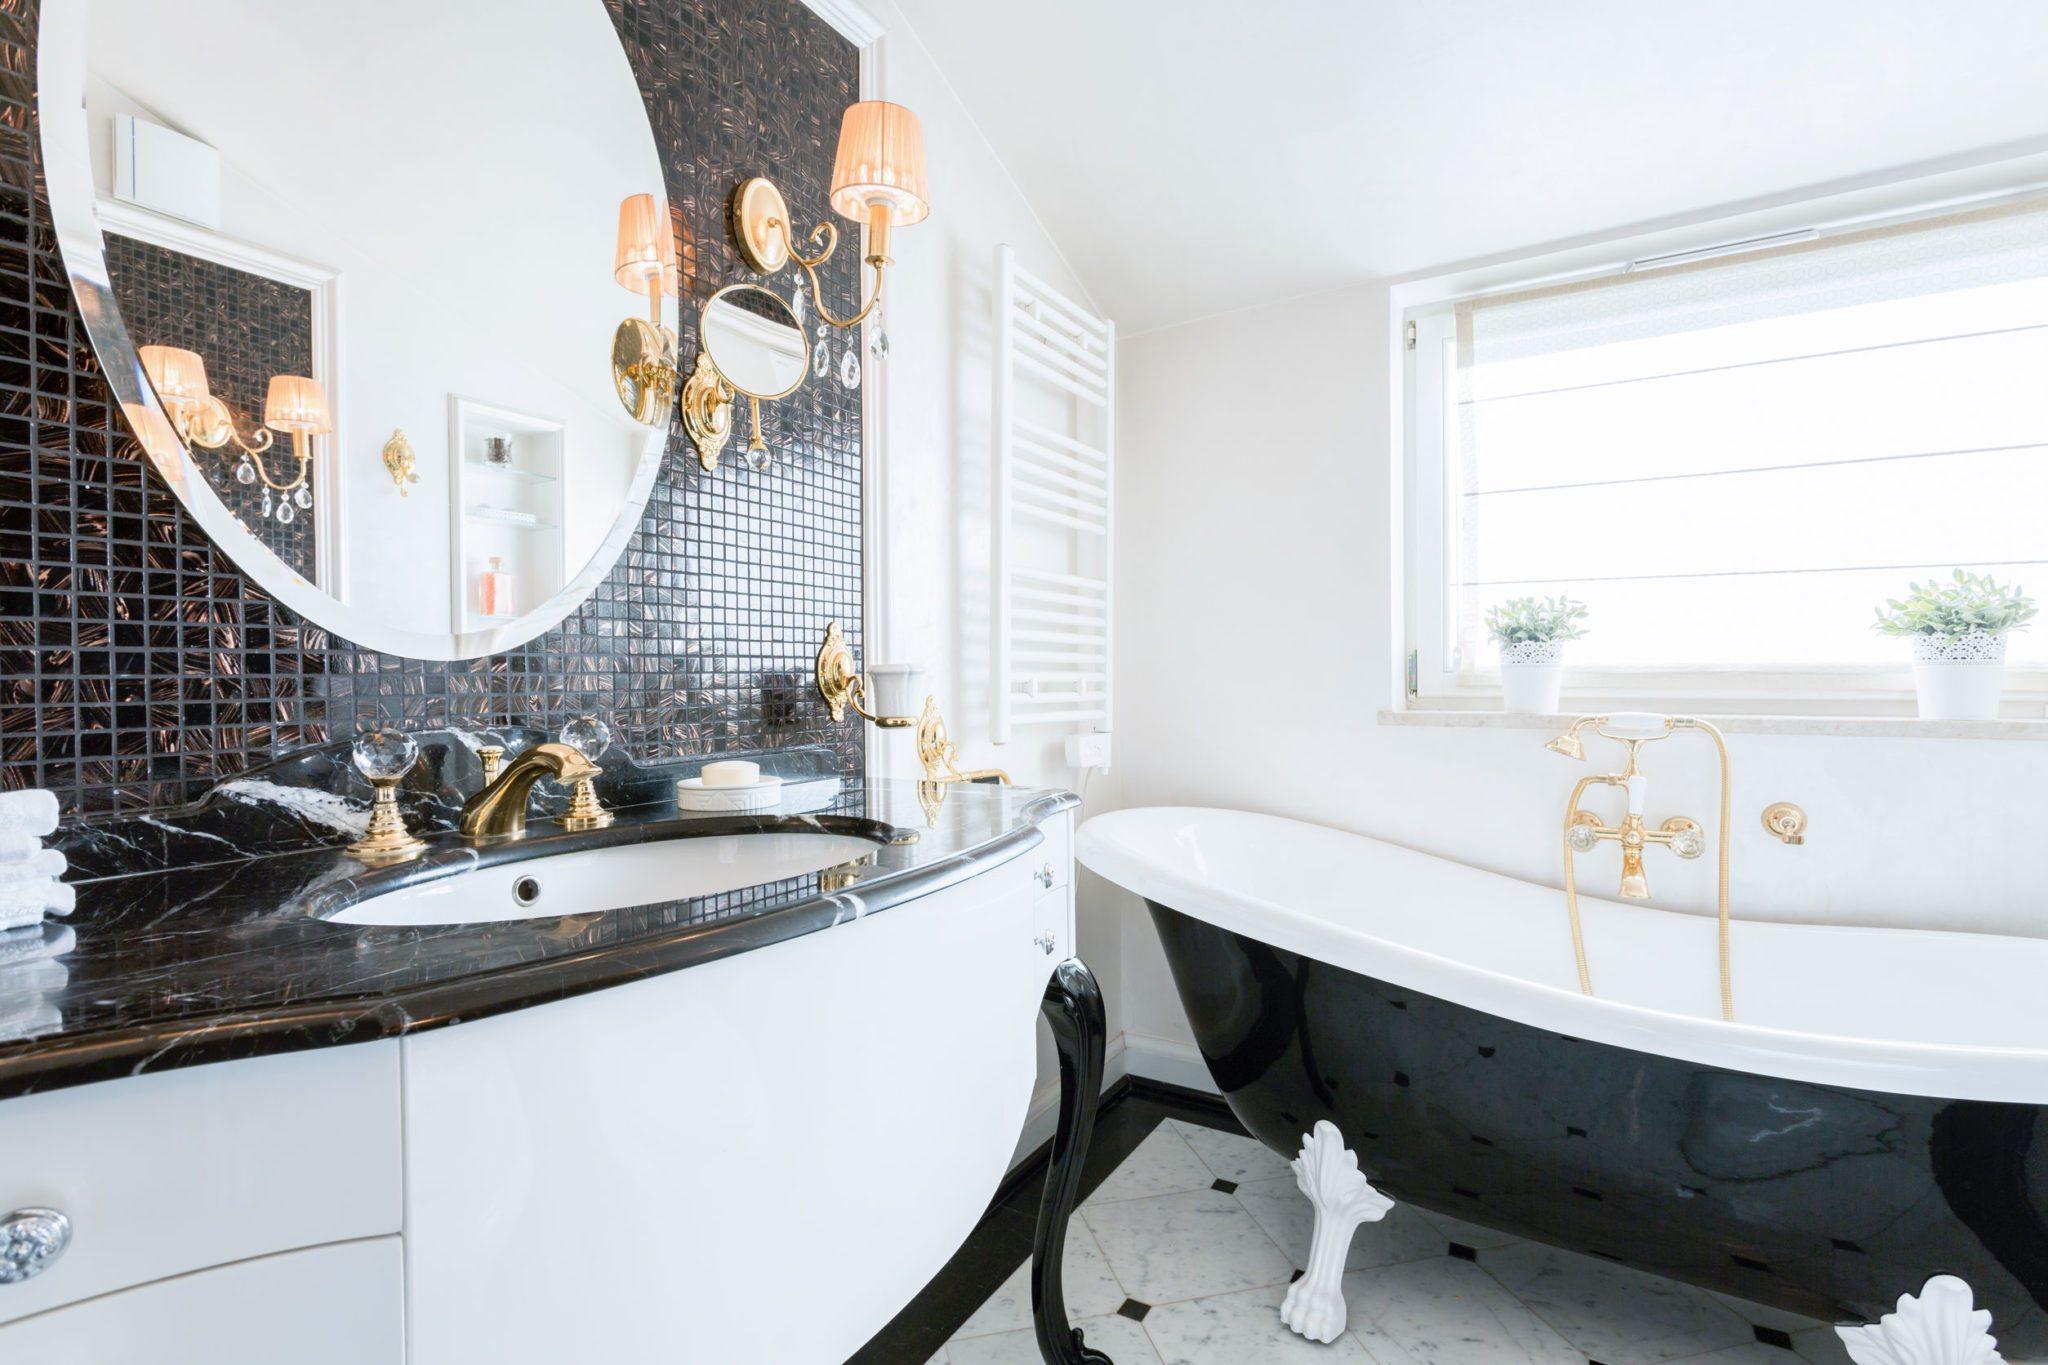 39459840 – image of new fashionable baroque style bathroom